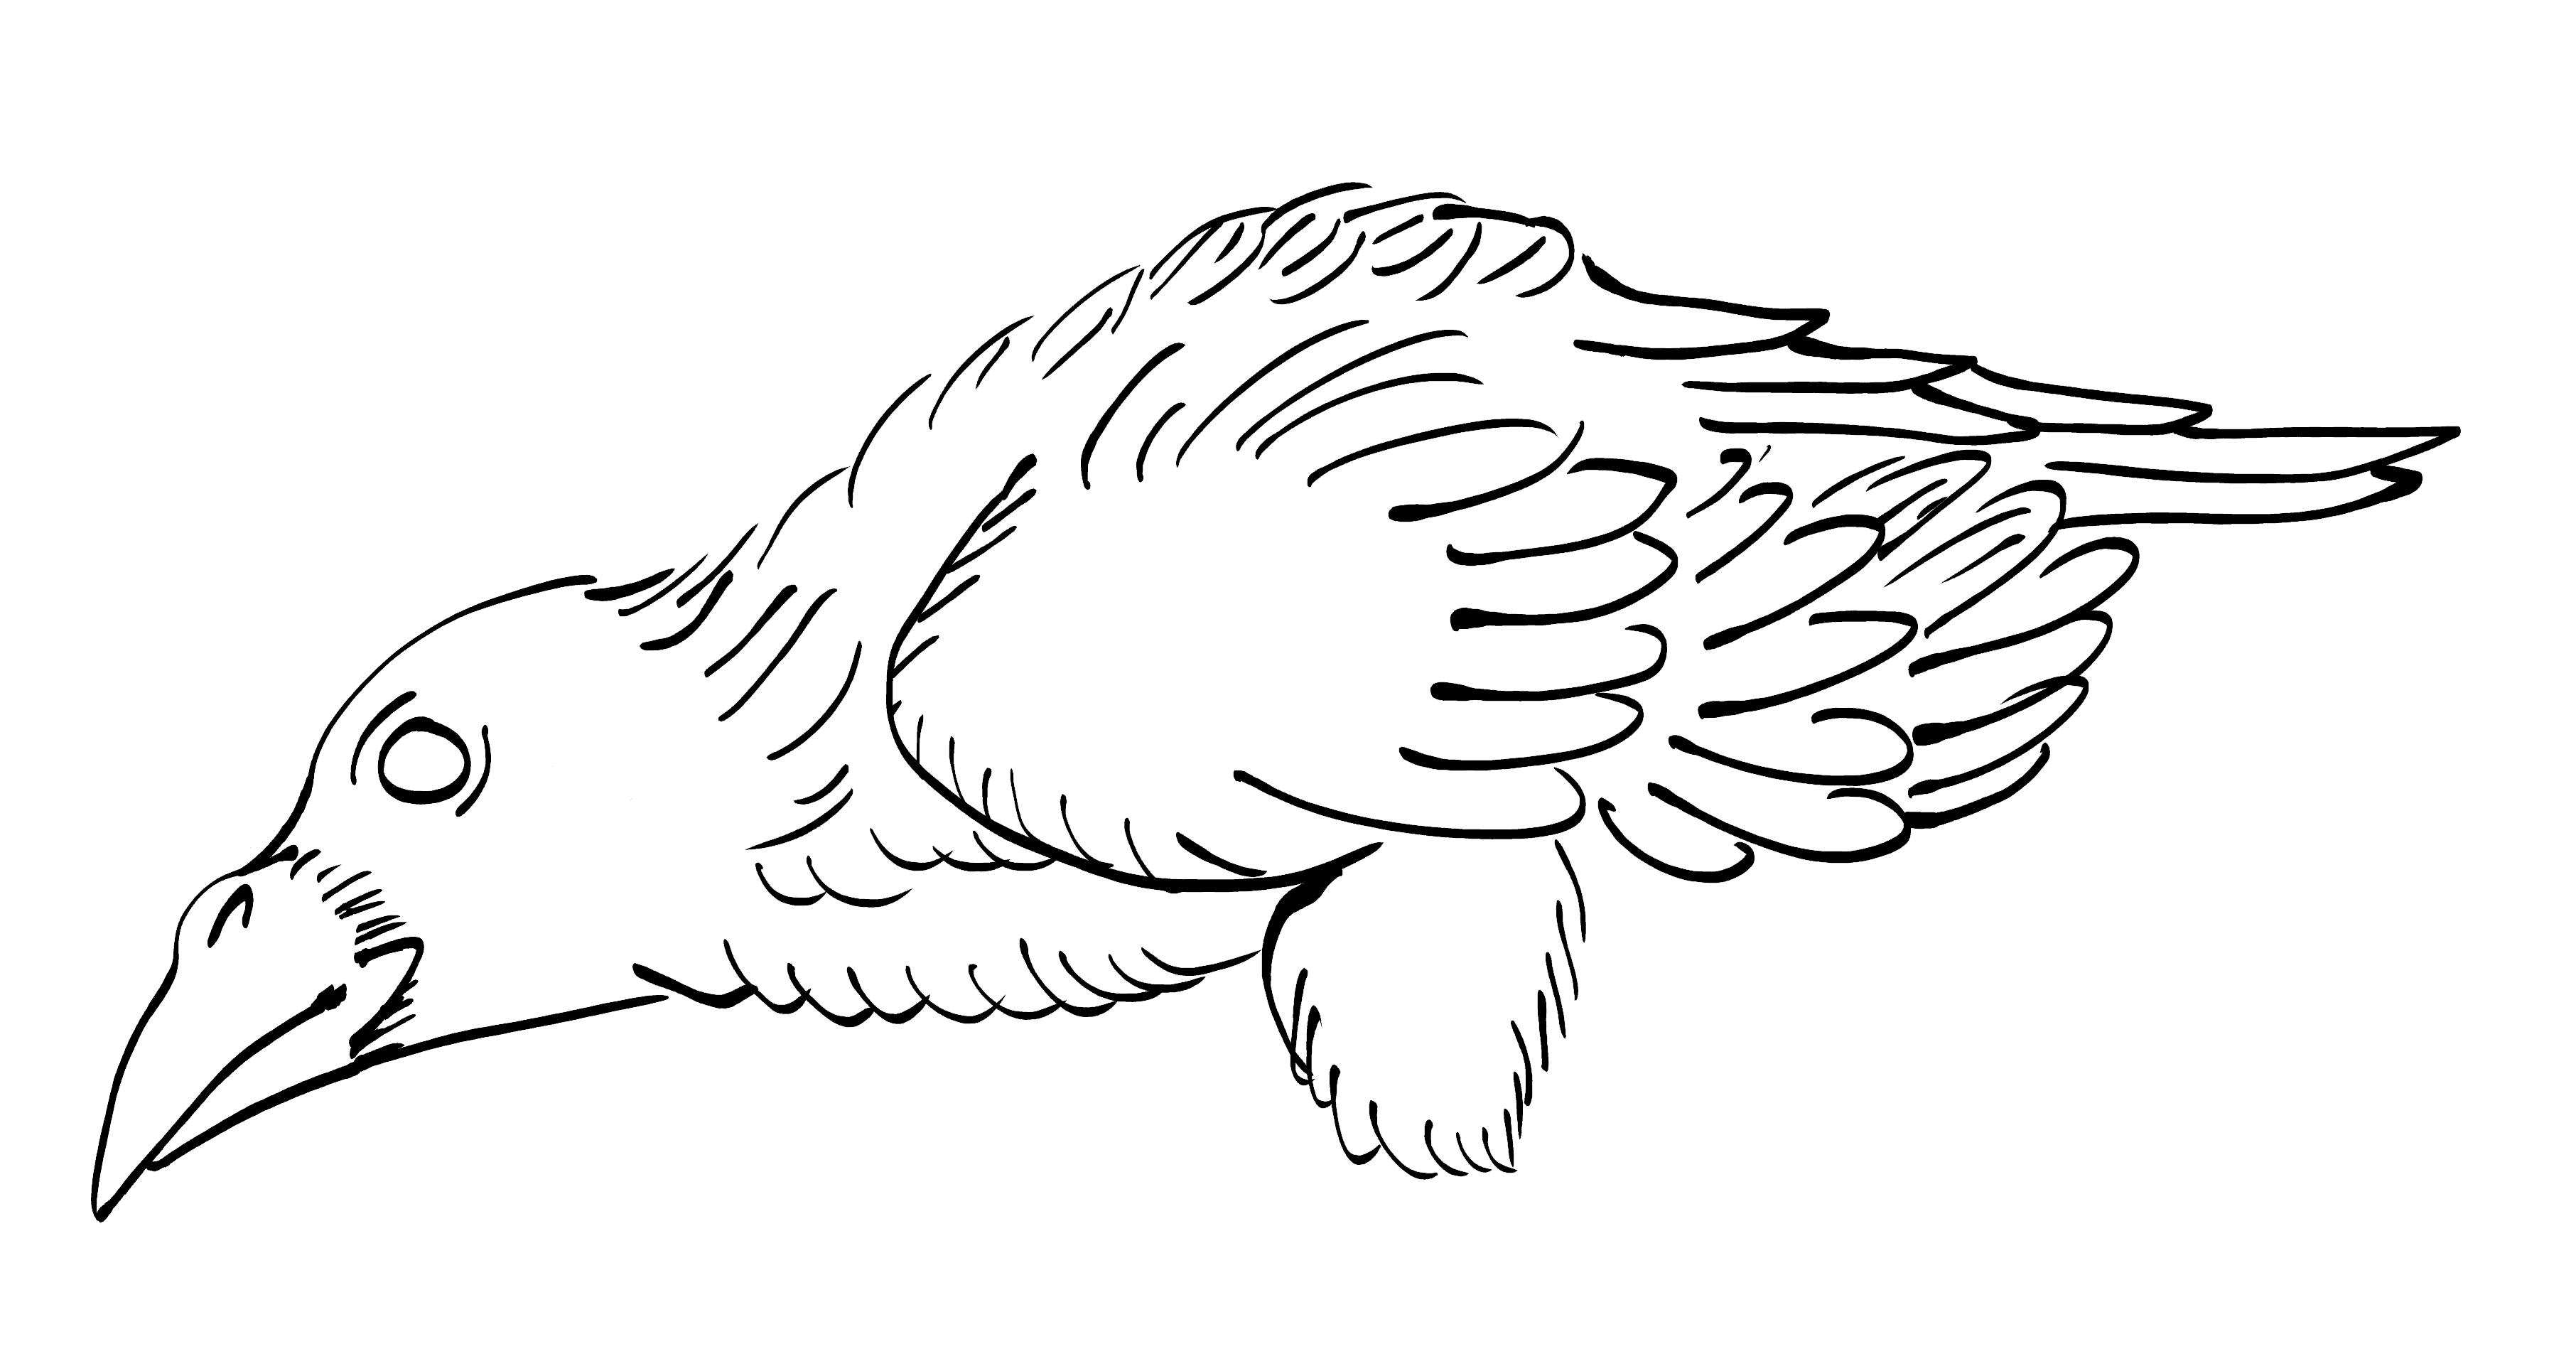 Crow Raven -ukiyo-e BlackandWhite6-(からす) by RedSparkle (11-2019)